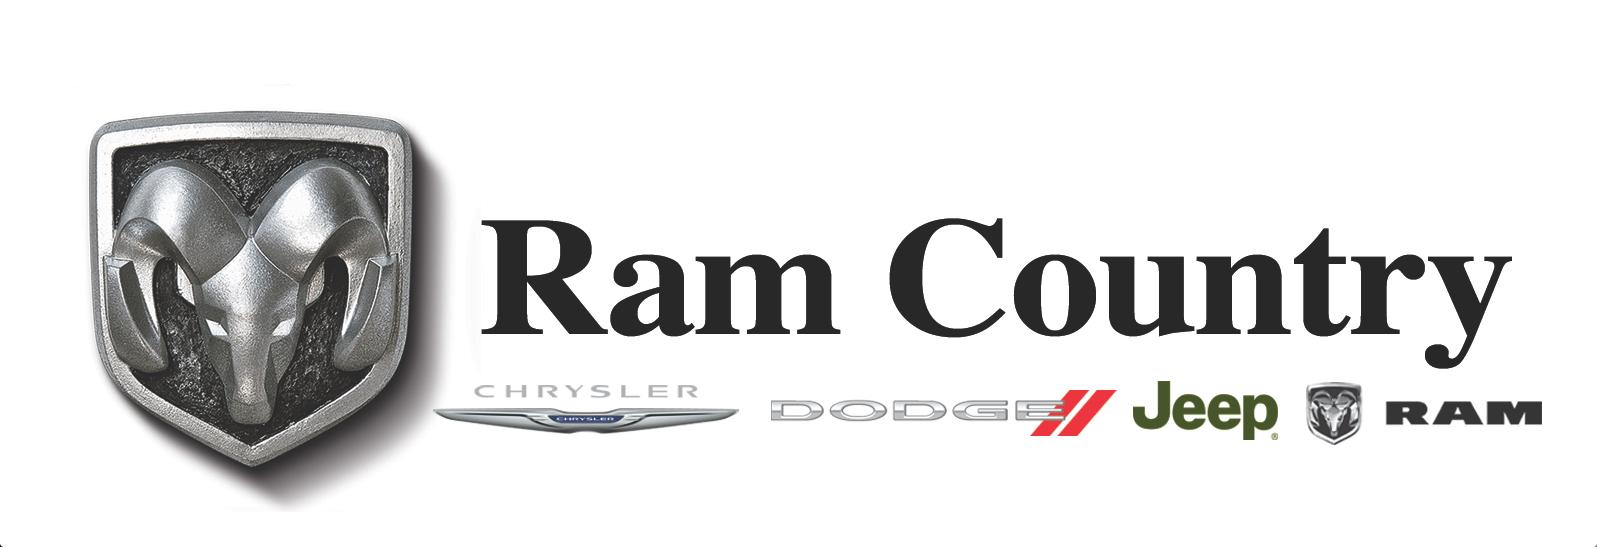 Ram Country Chrysler Jeep Dodge - Del Rio, TX: Read ...